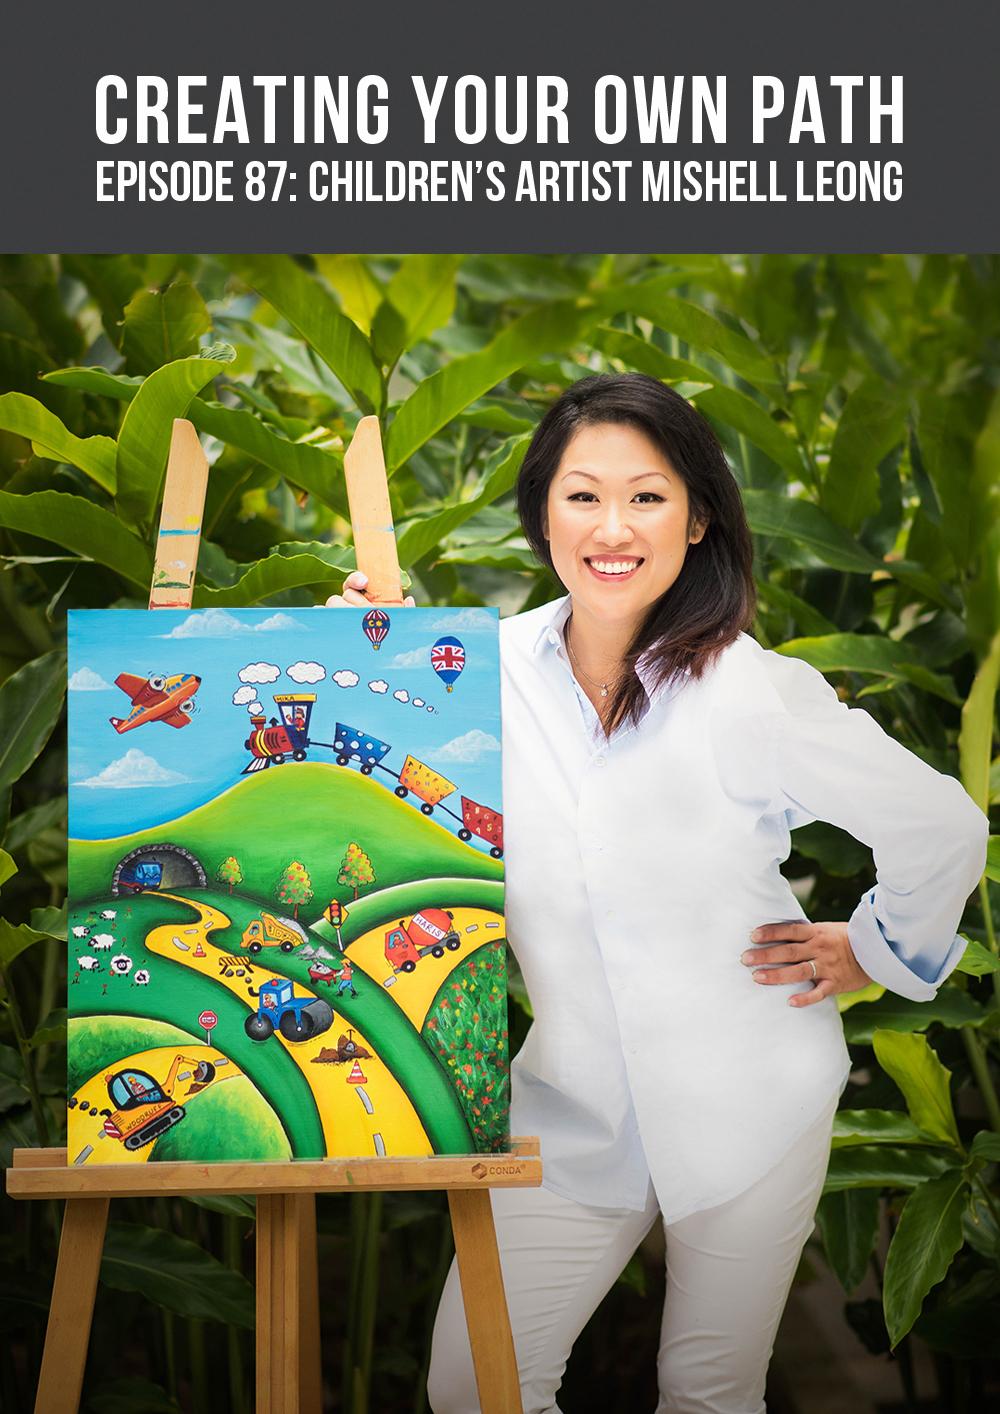 CYOP #87 - Children's Artist Mishell Leong // creatingyourownpath.com